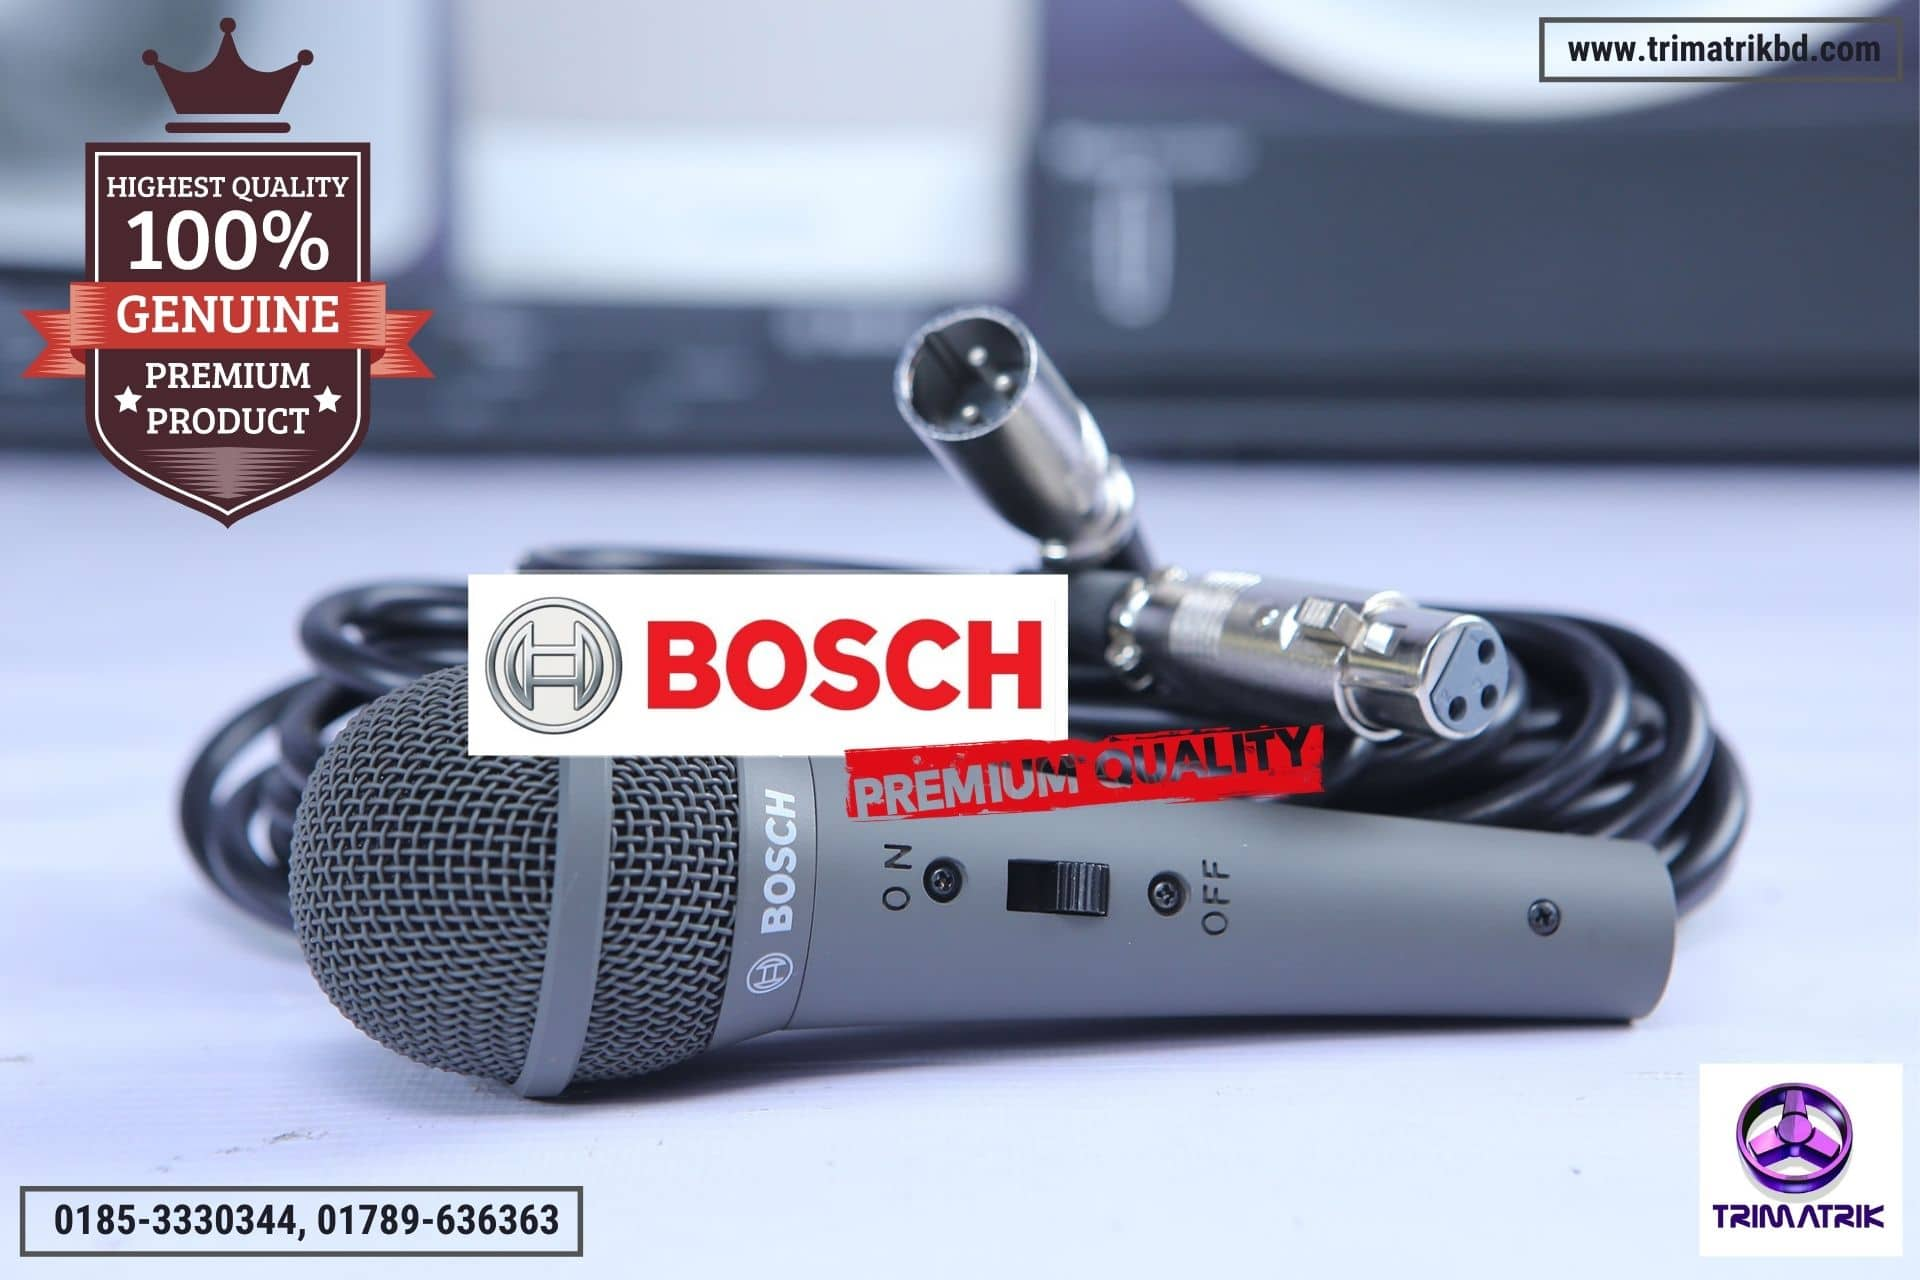 Bosch LBC 2900/20 Unidirectional Handheld Microphone Best Price in Bangladesh